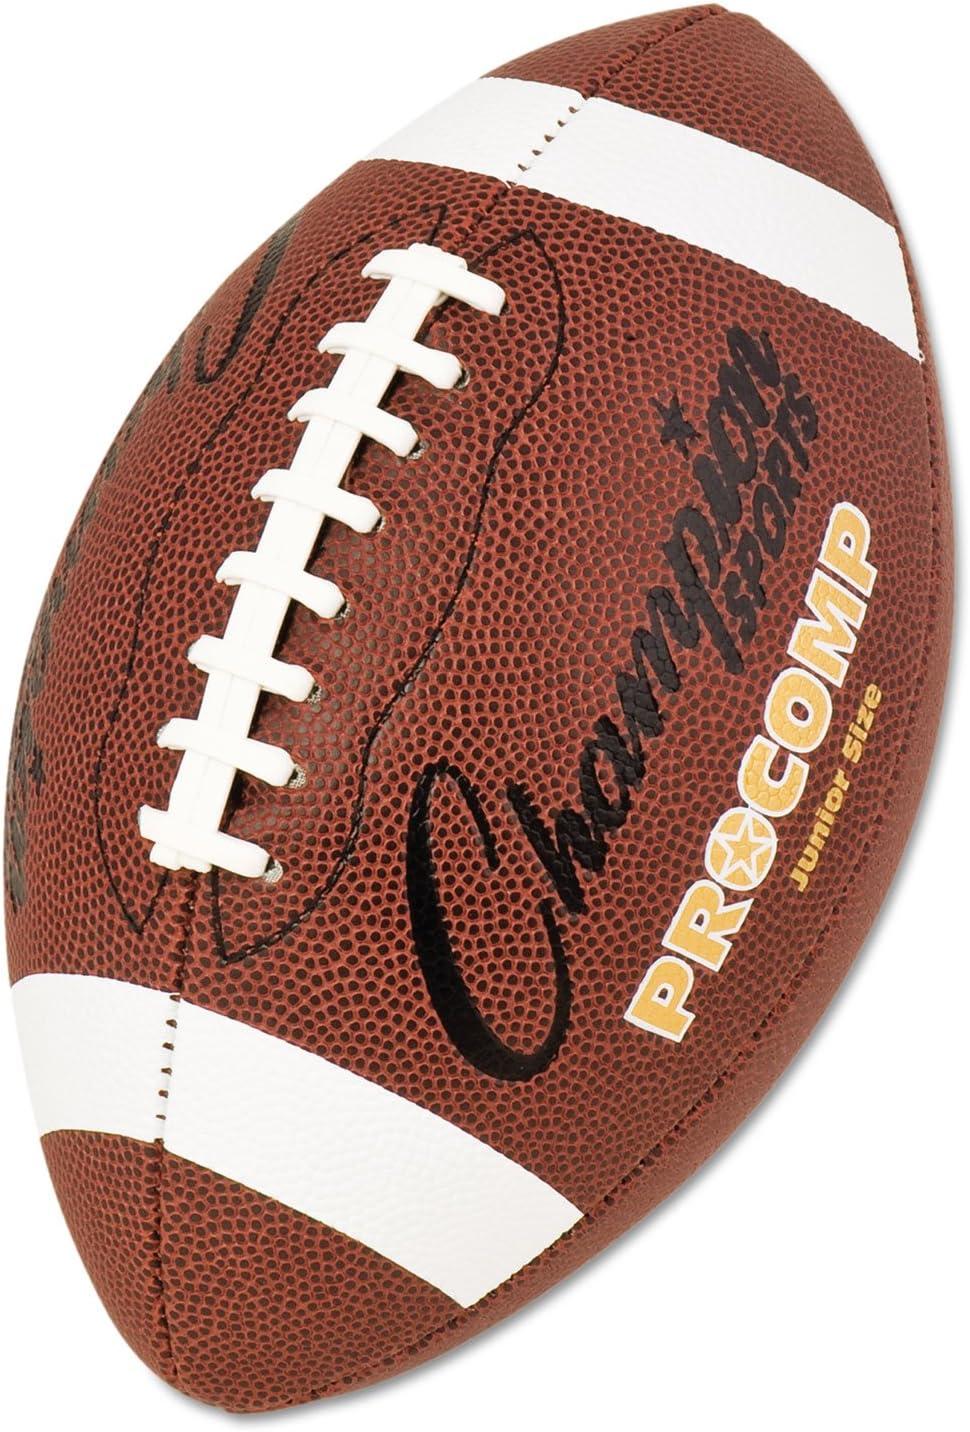 CHAMPION SPORTS Pro Comp - Balón de fútbol para niño: Amazon.es ...